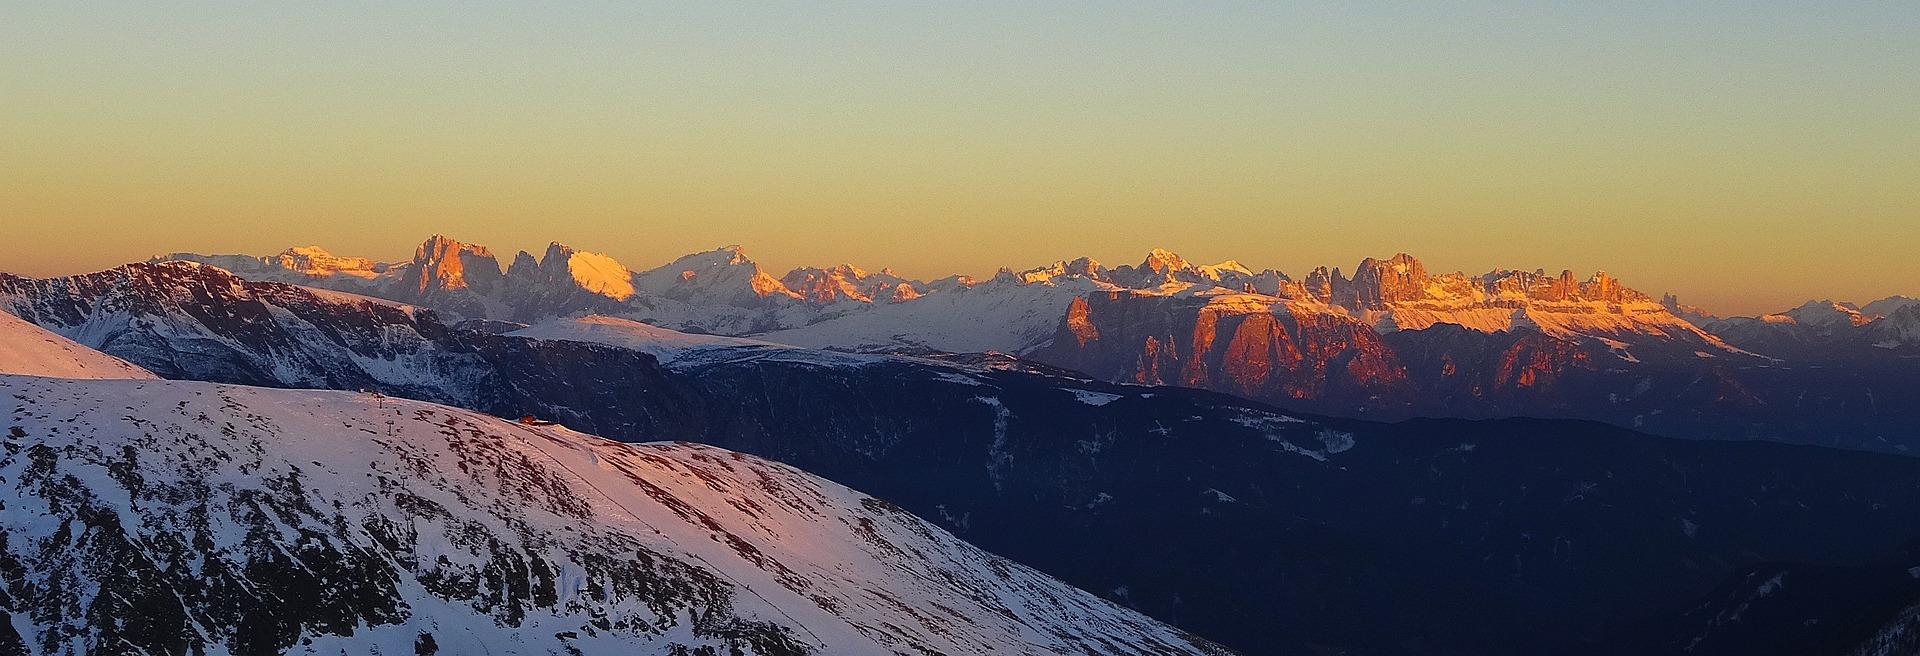 sunset-656609_1920